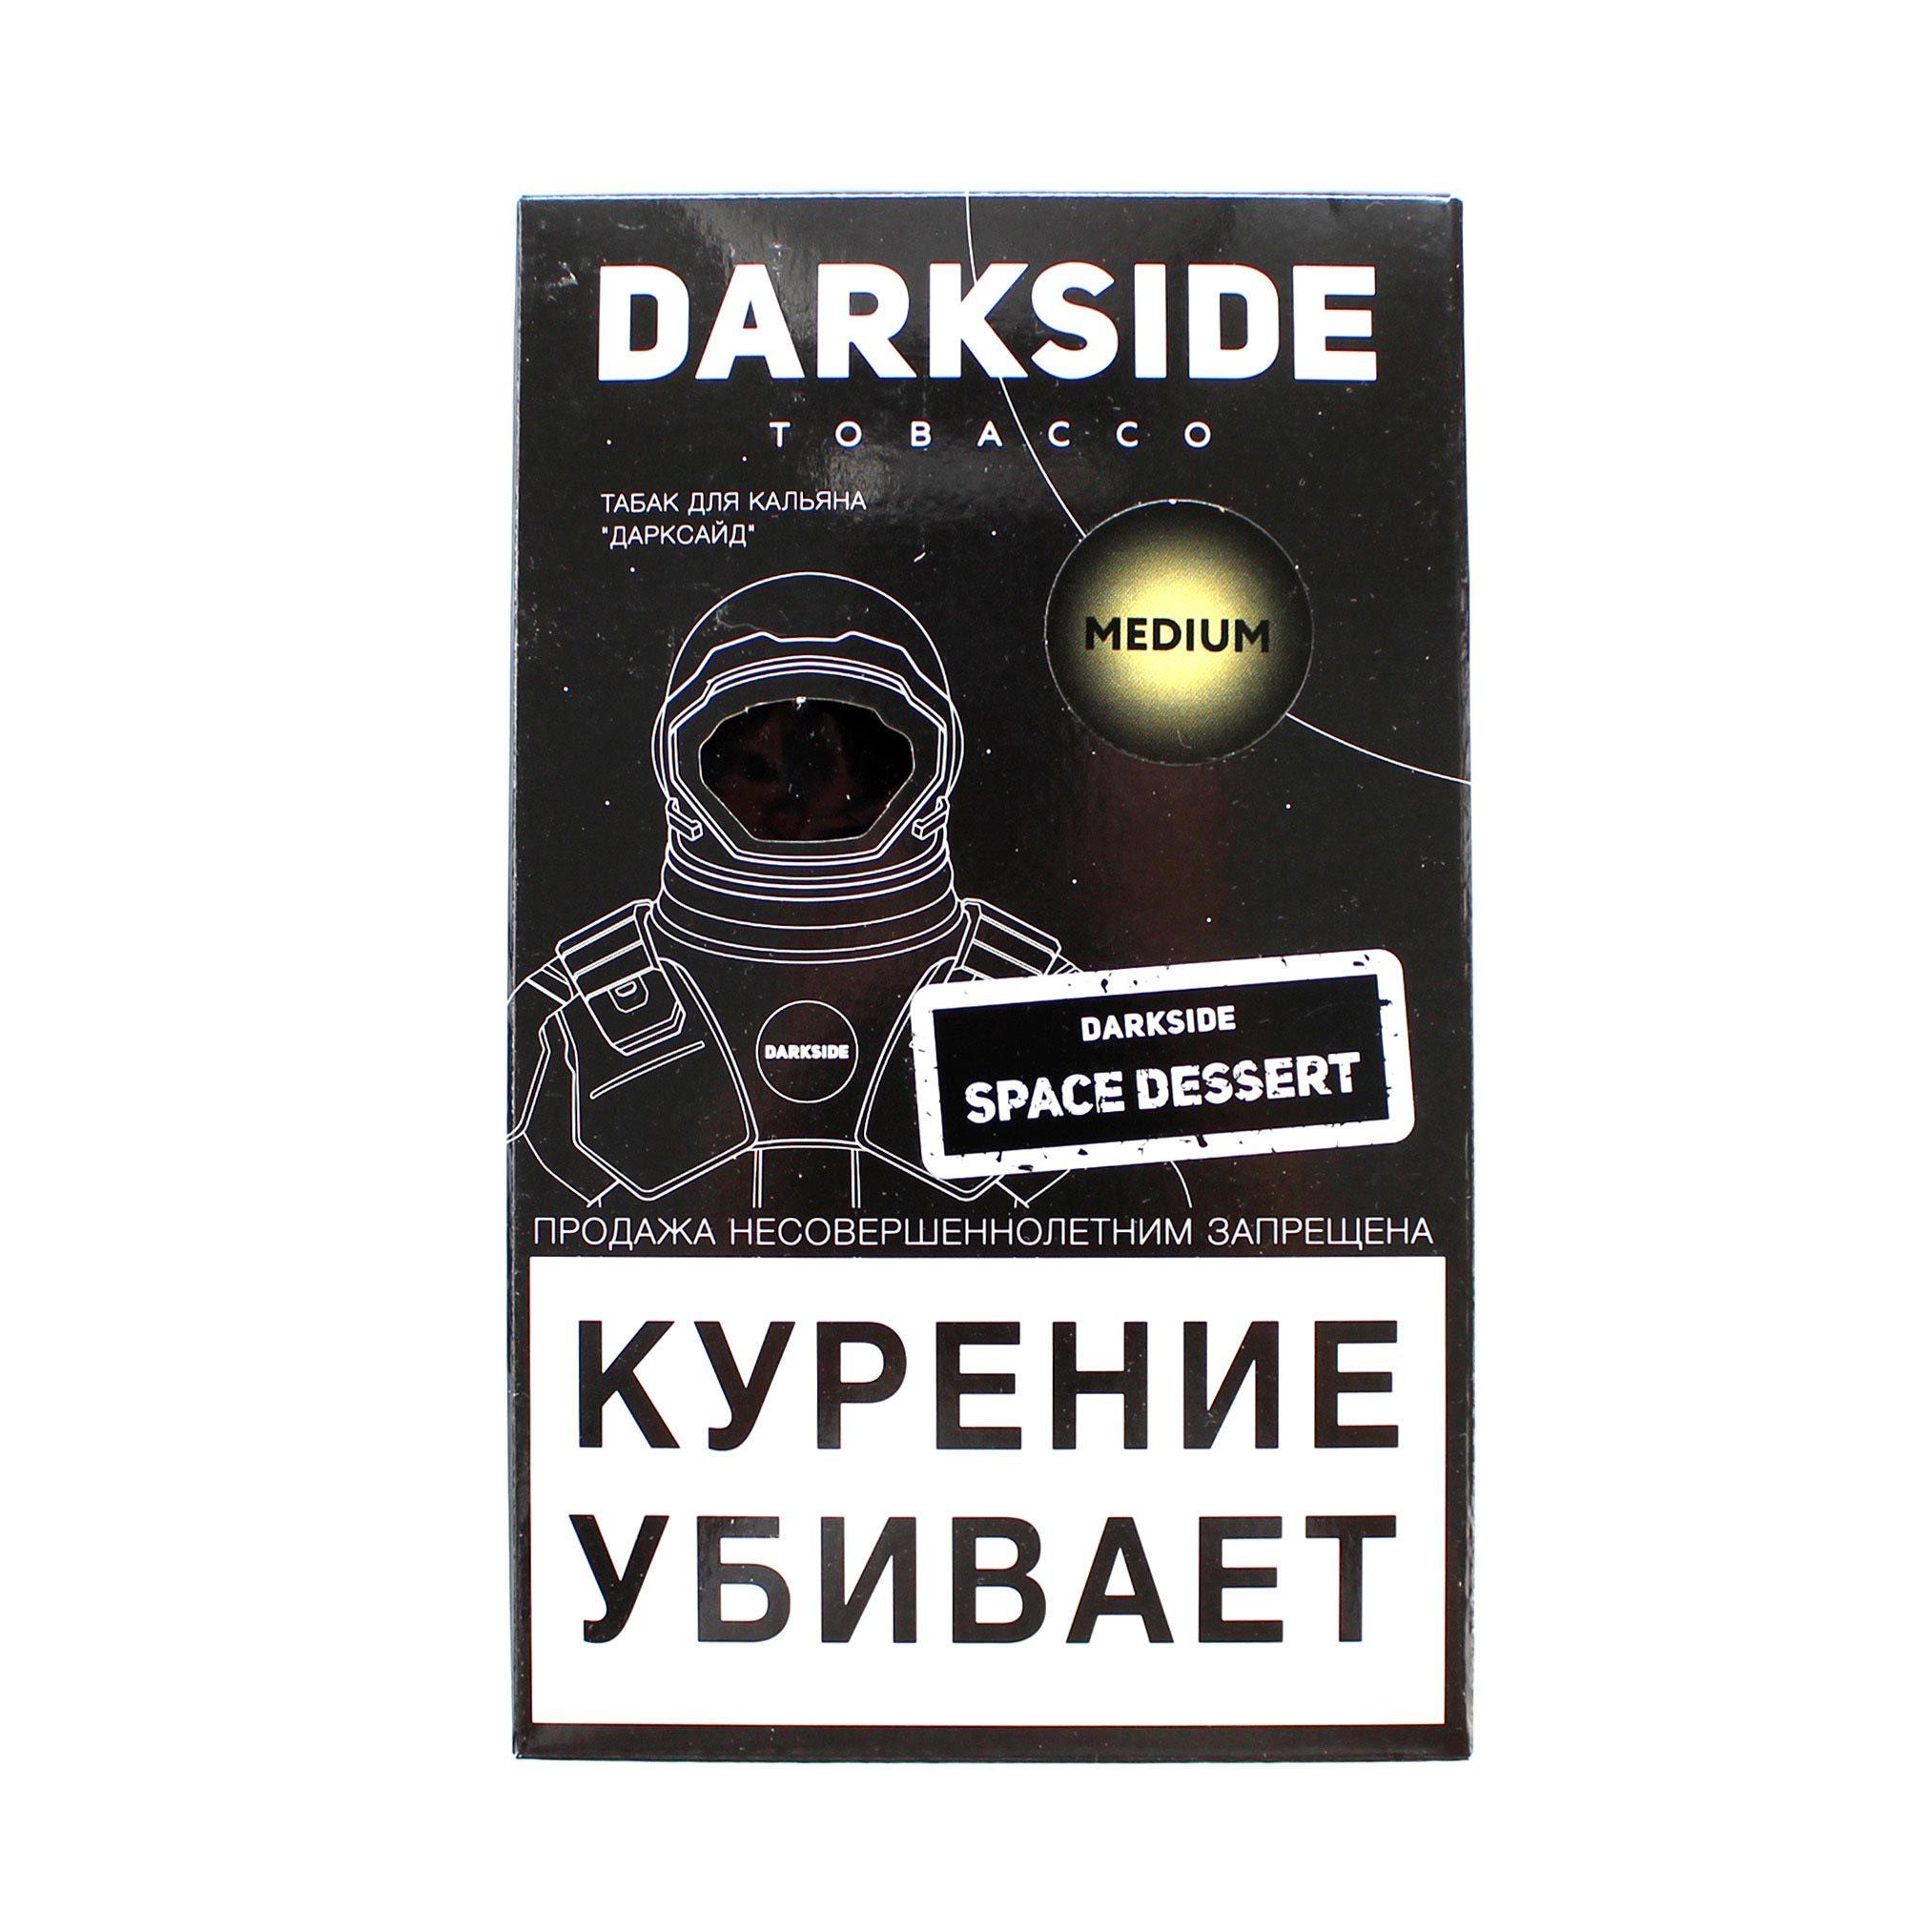 Табак для кальяна Dark Side Medium 100 гр. Space dessert